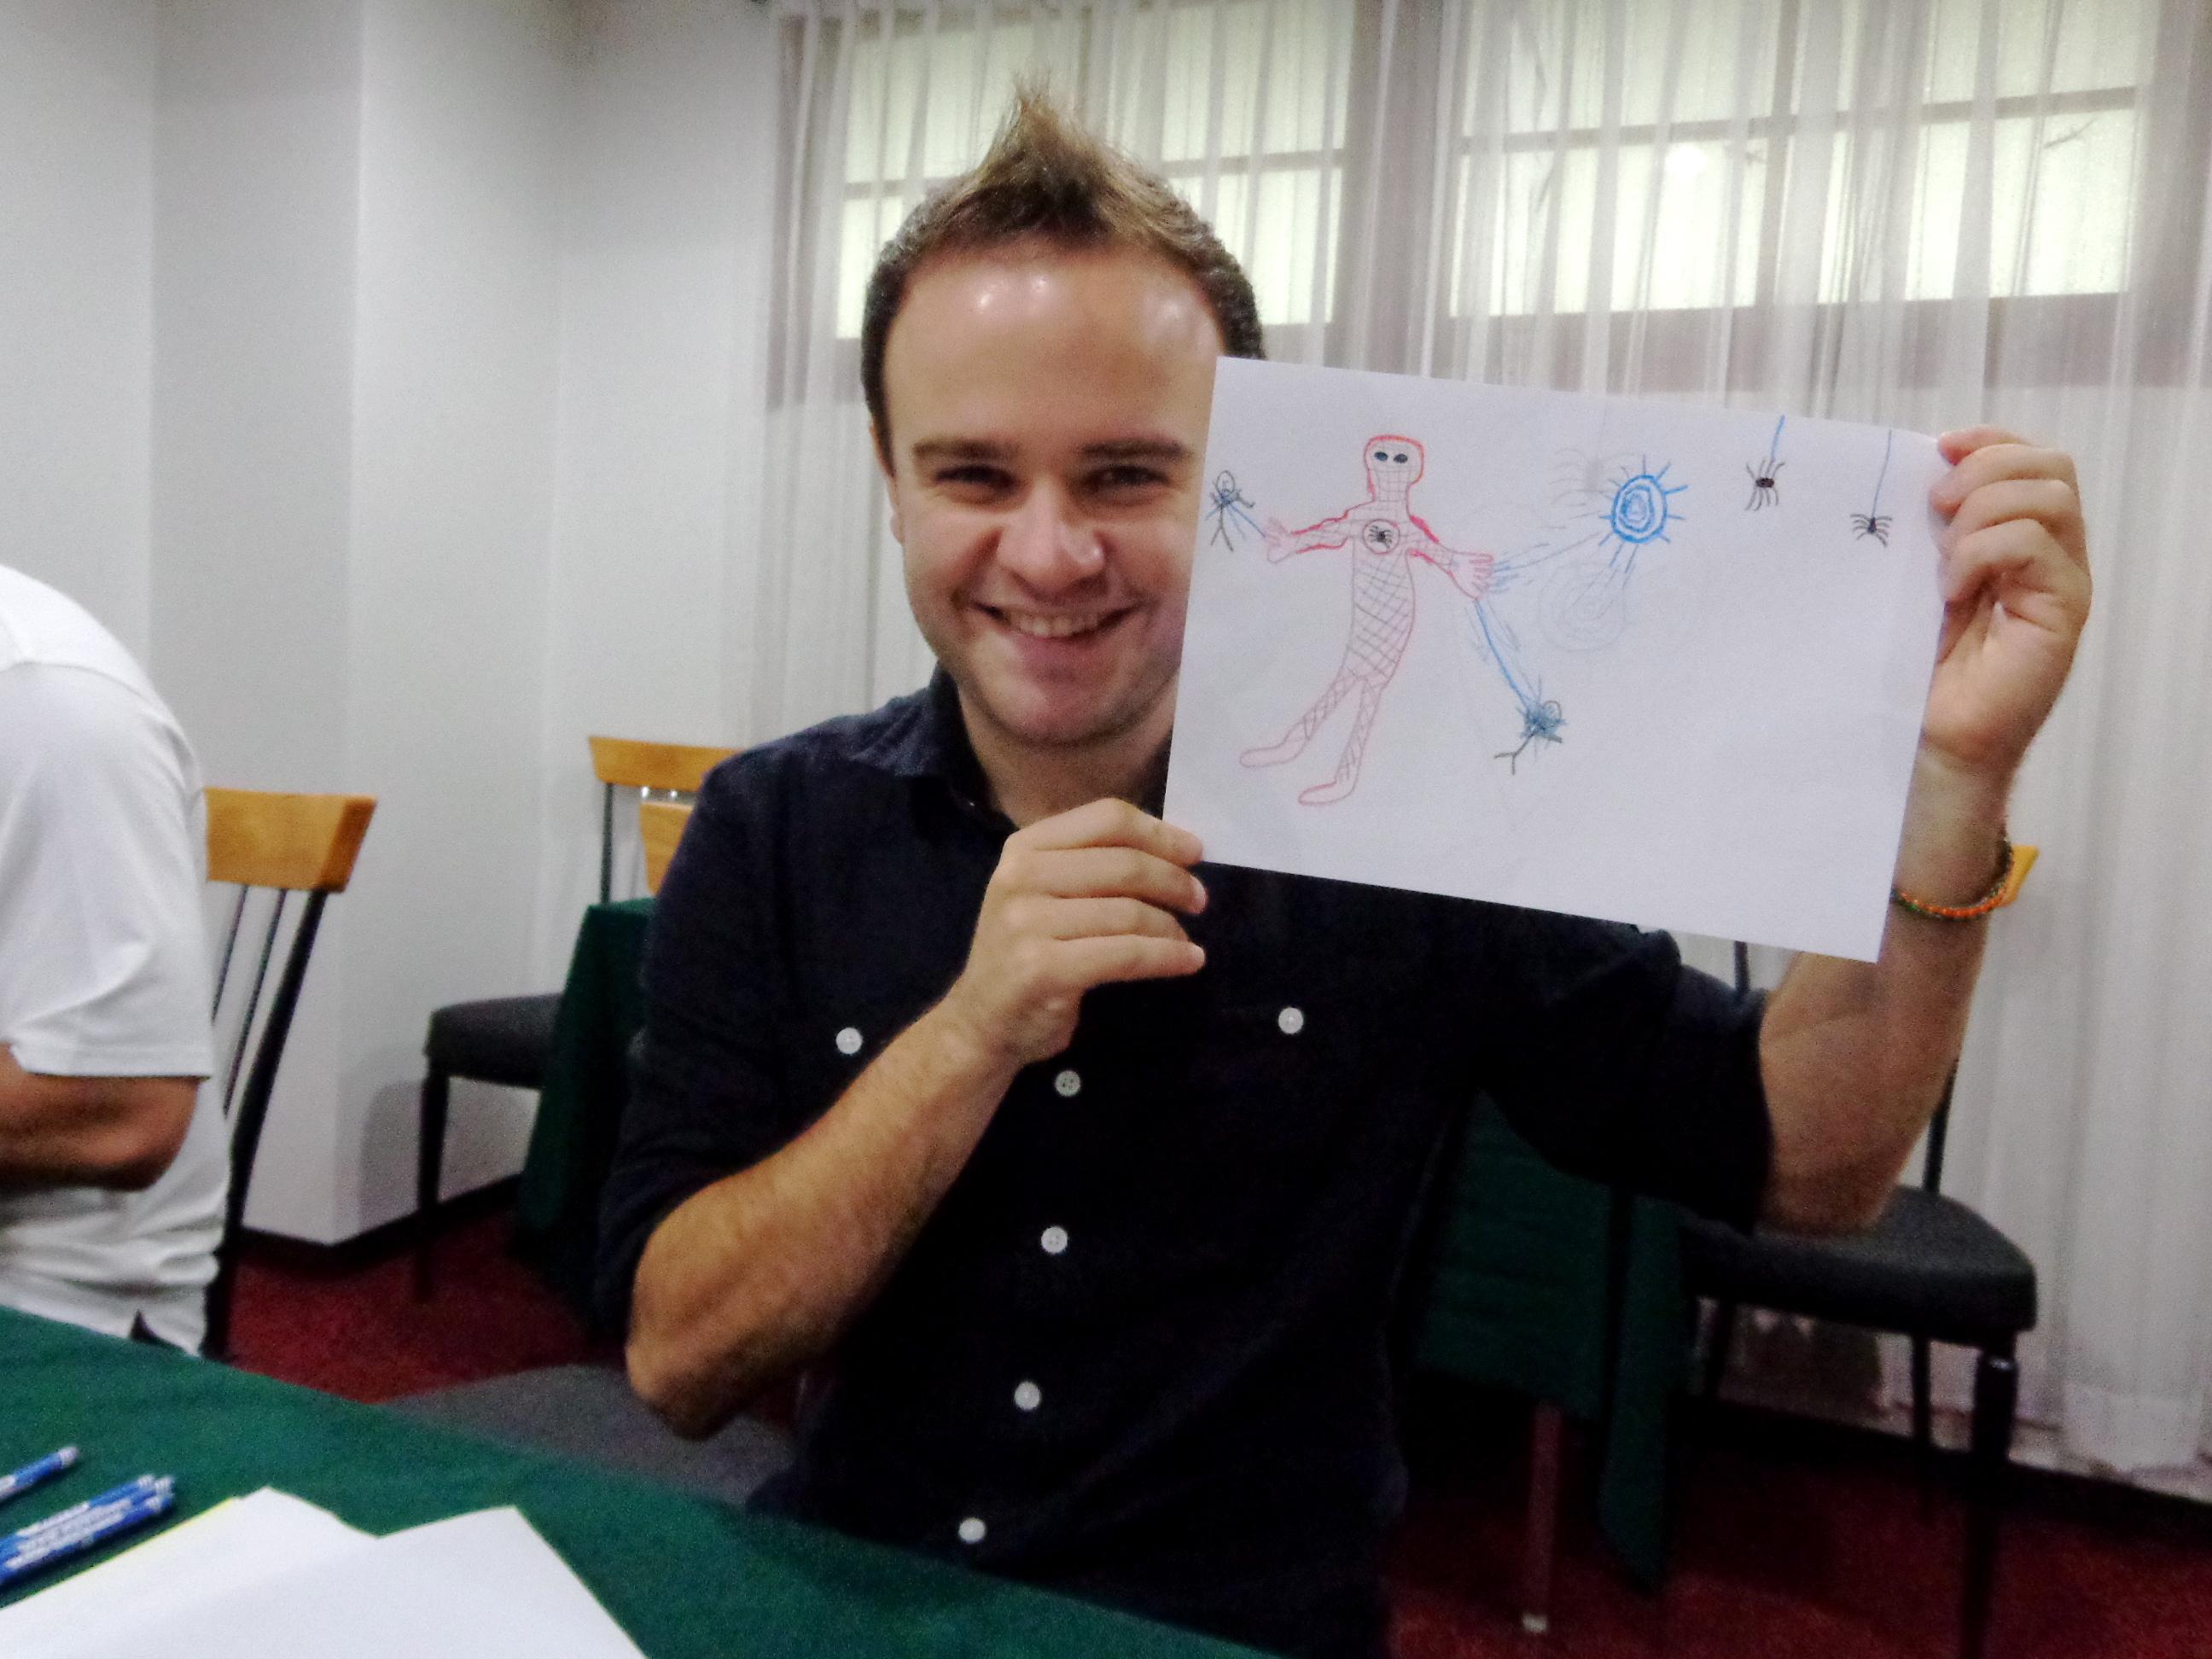 ATI special thai project class